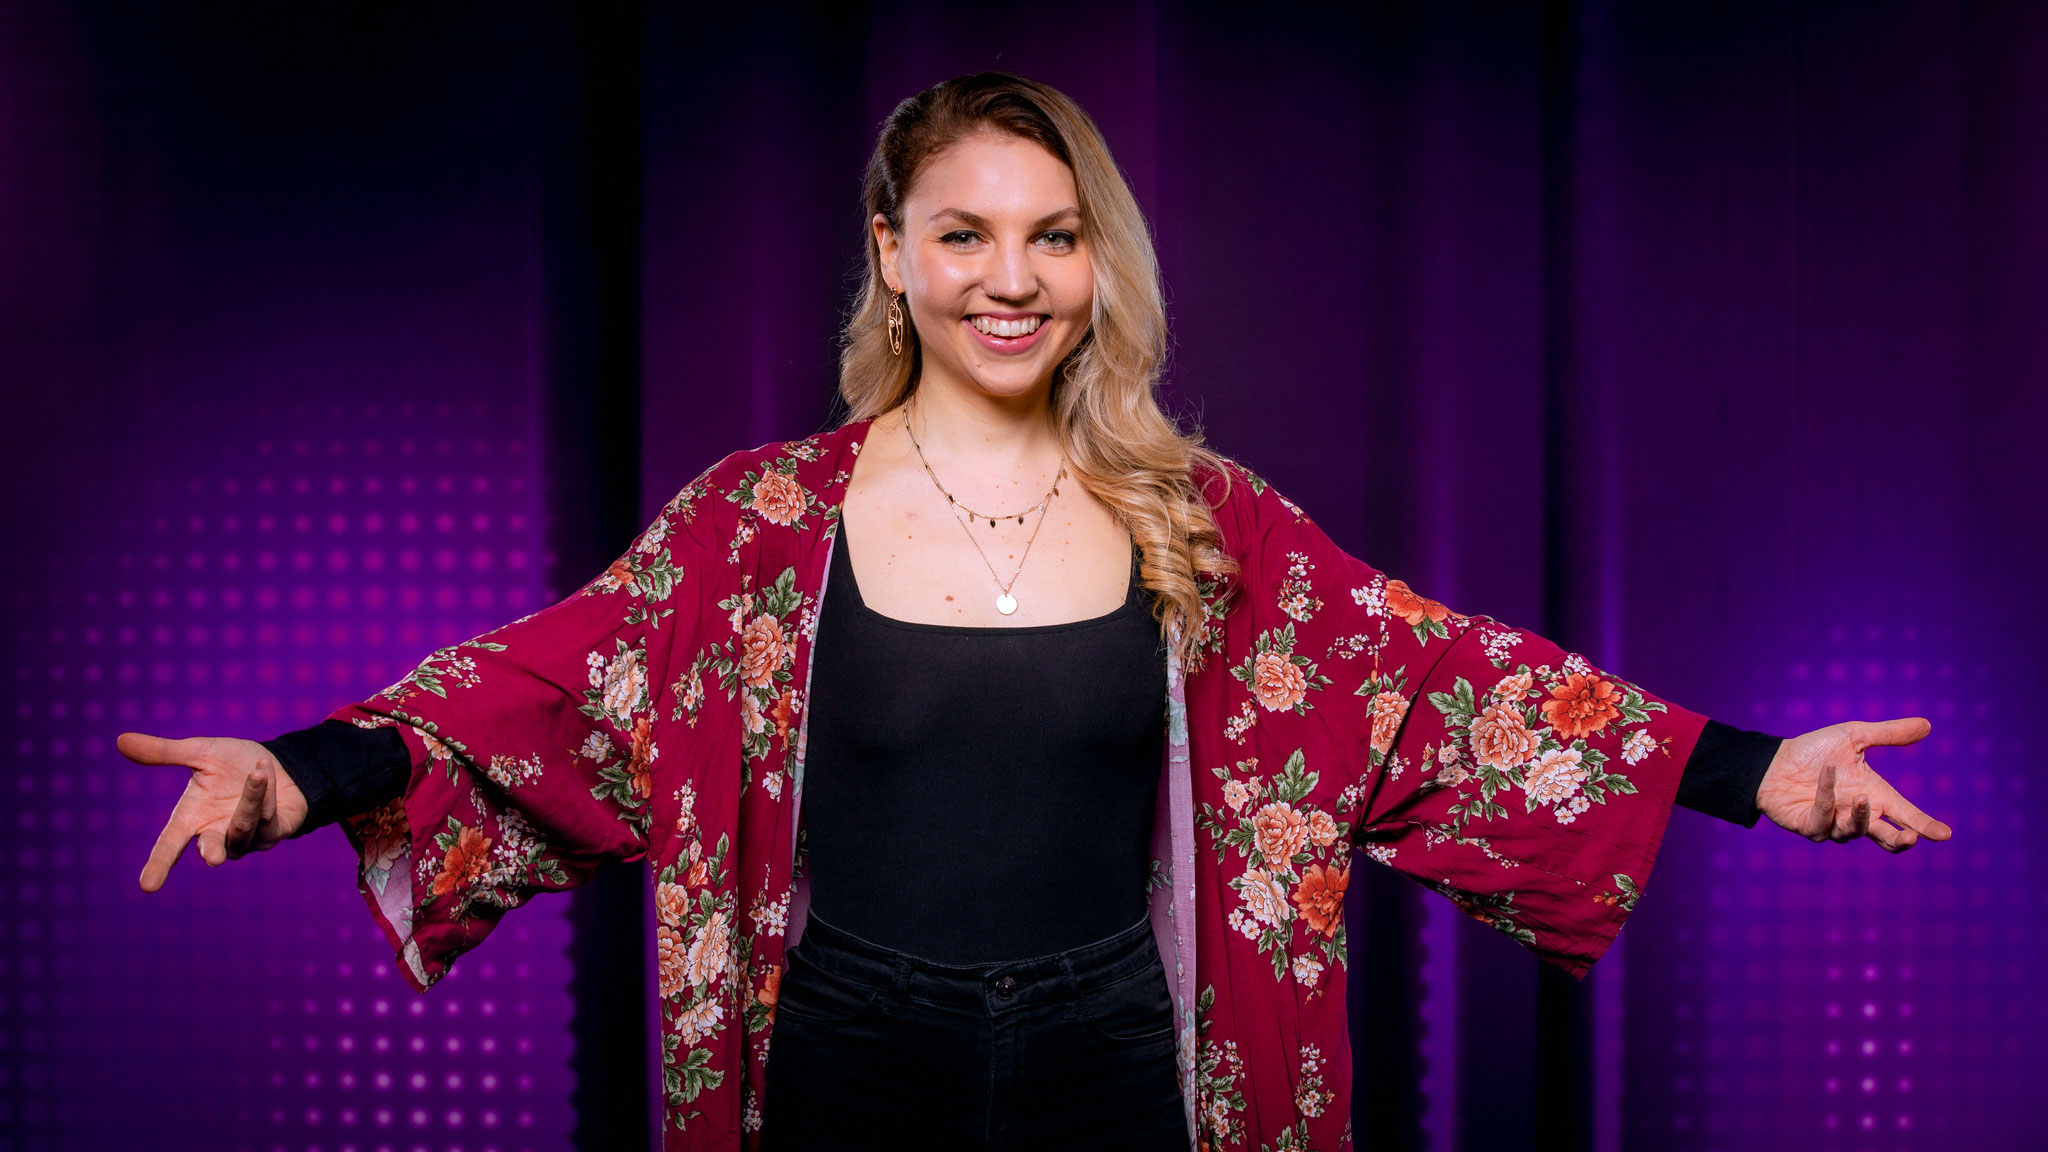 Corona-Fall bei Starmania: Magdalena Huber singt statt Maria Aschenwald am Freitag